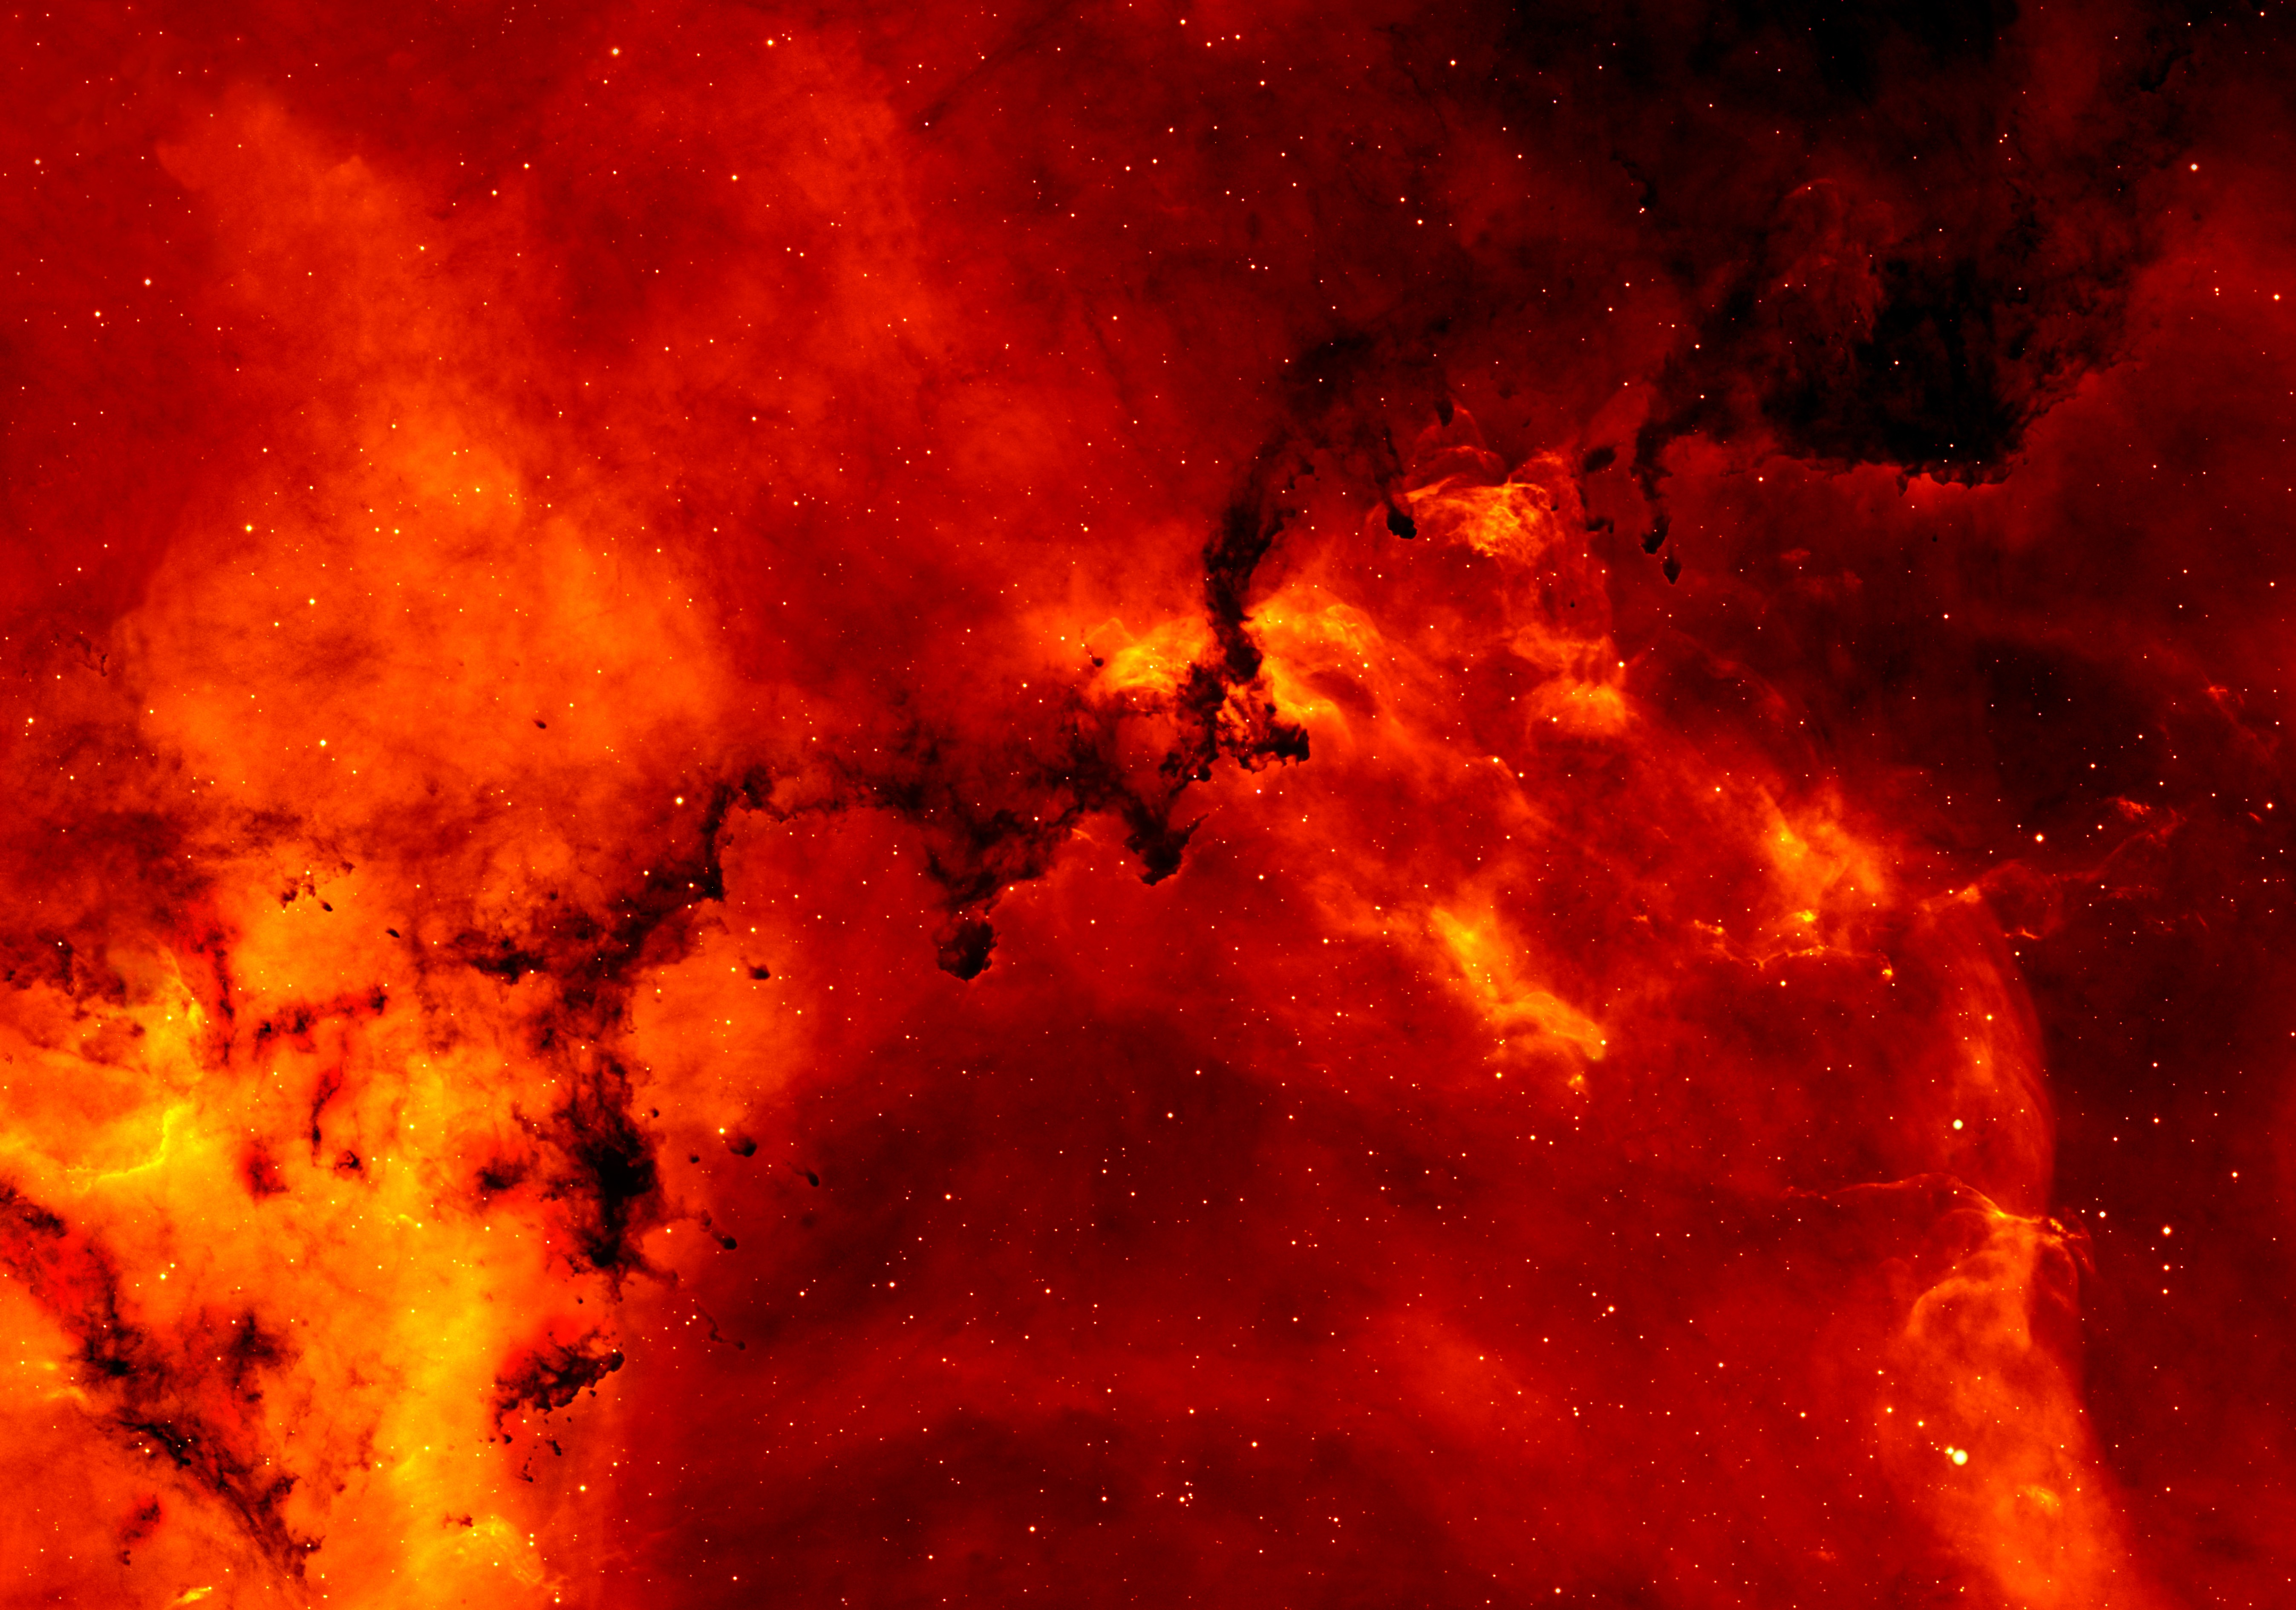 Red and Orange Solar Flare · Free Stock Photo